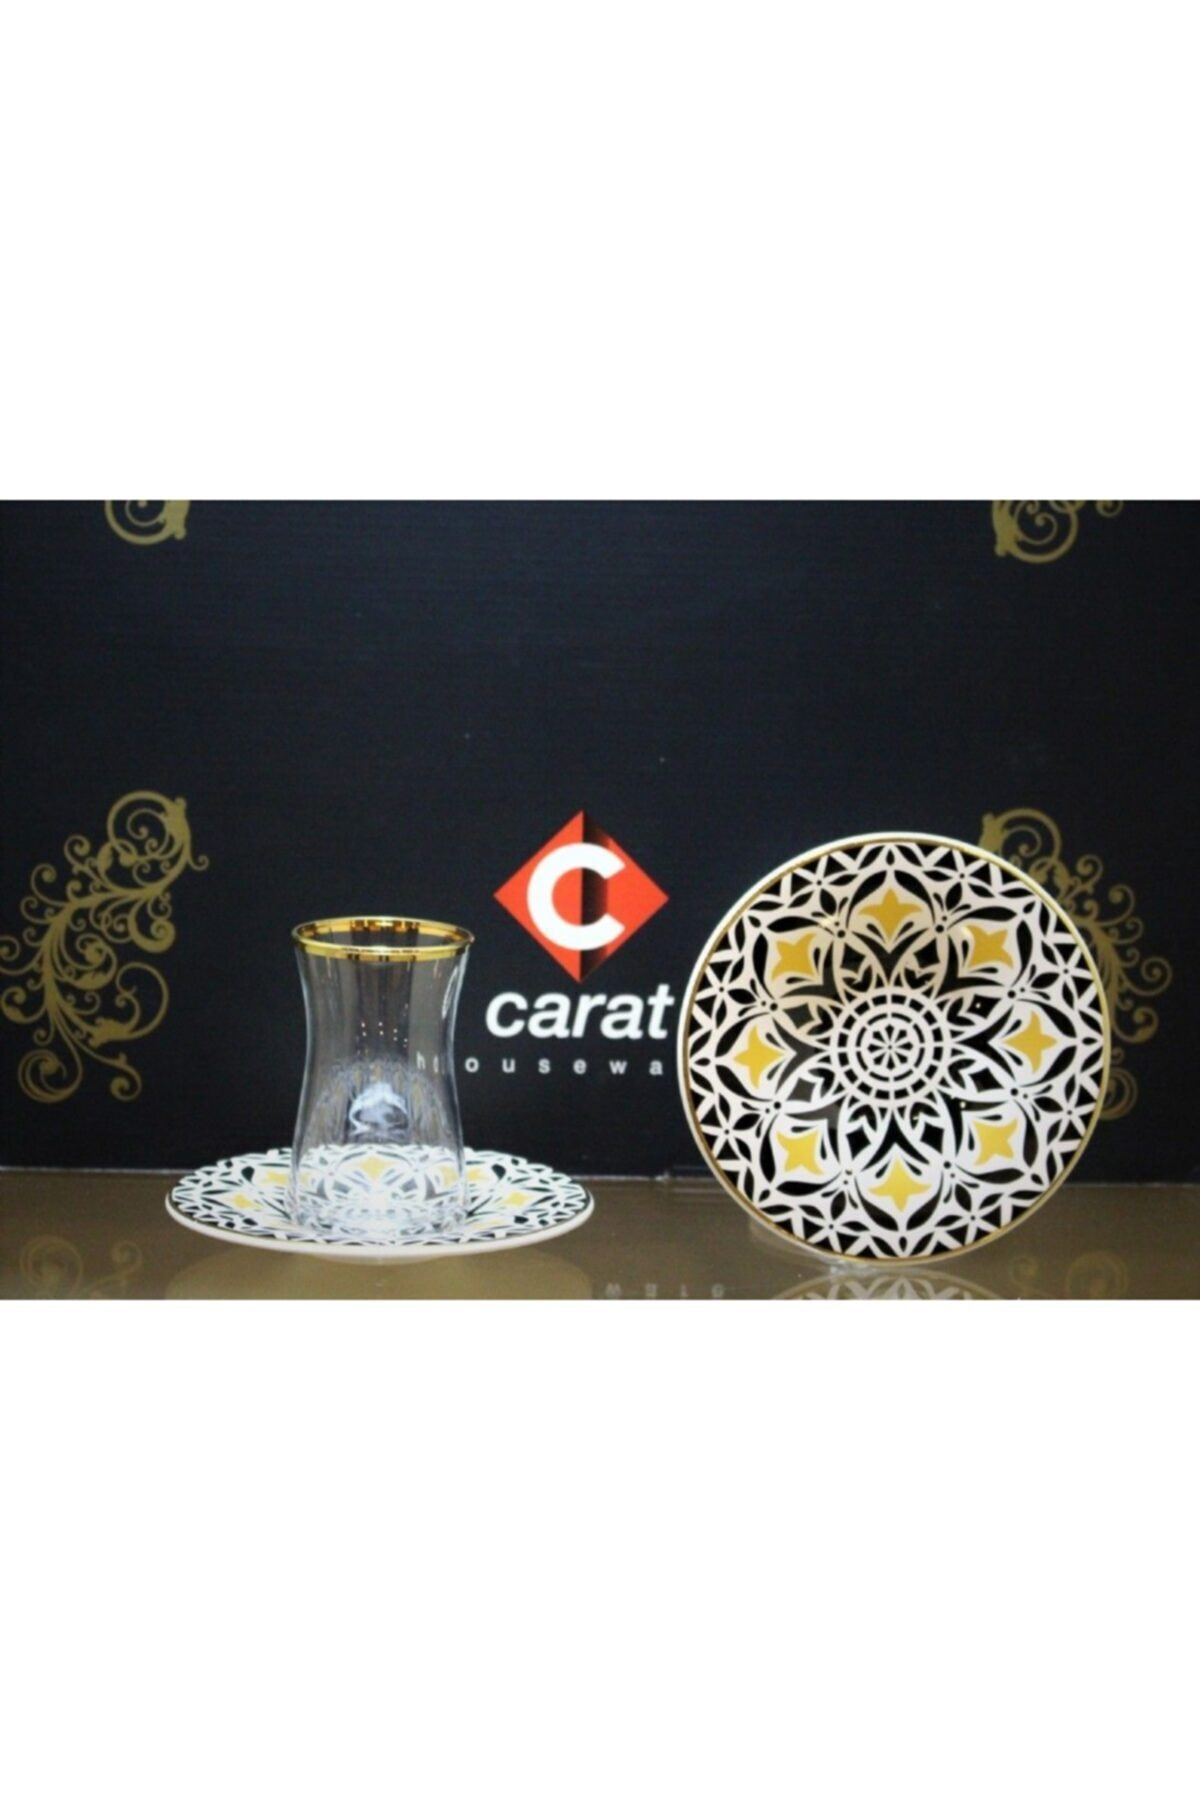 çerçi Carat 6 Lı Çay Bardağı Lale 1